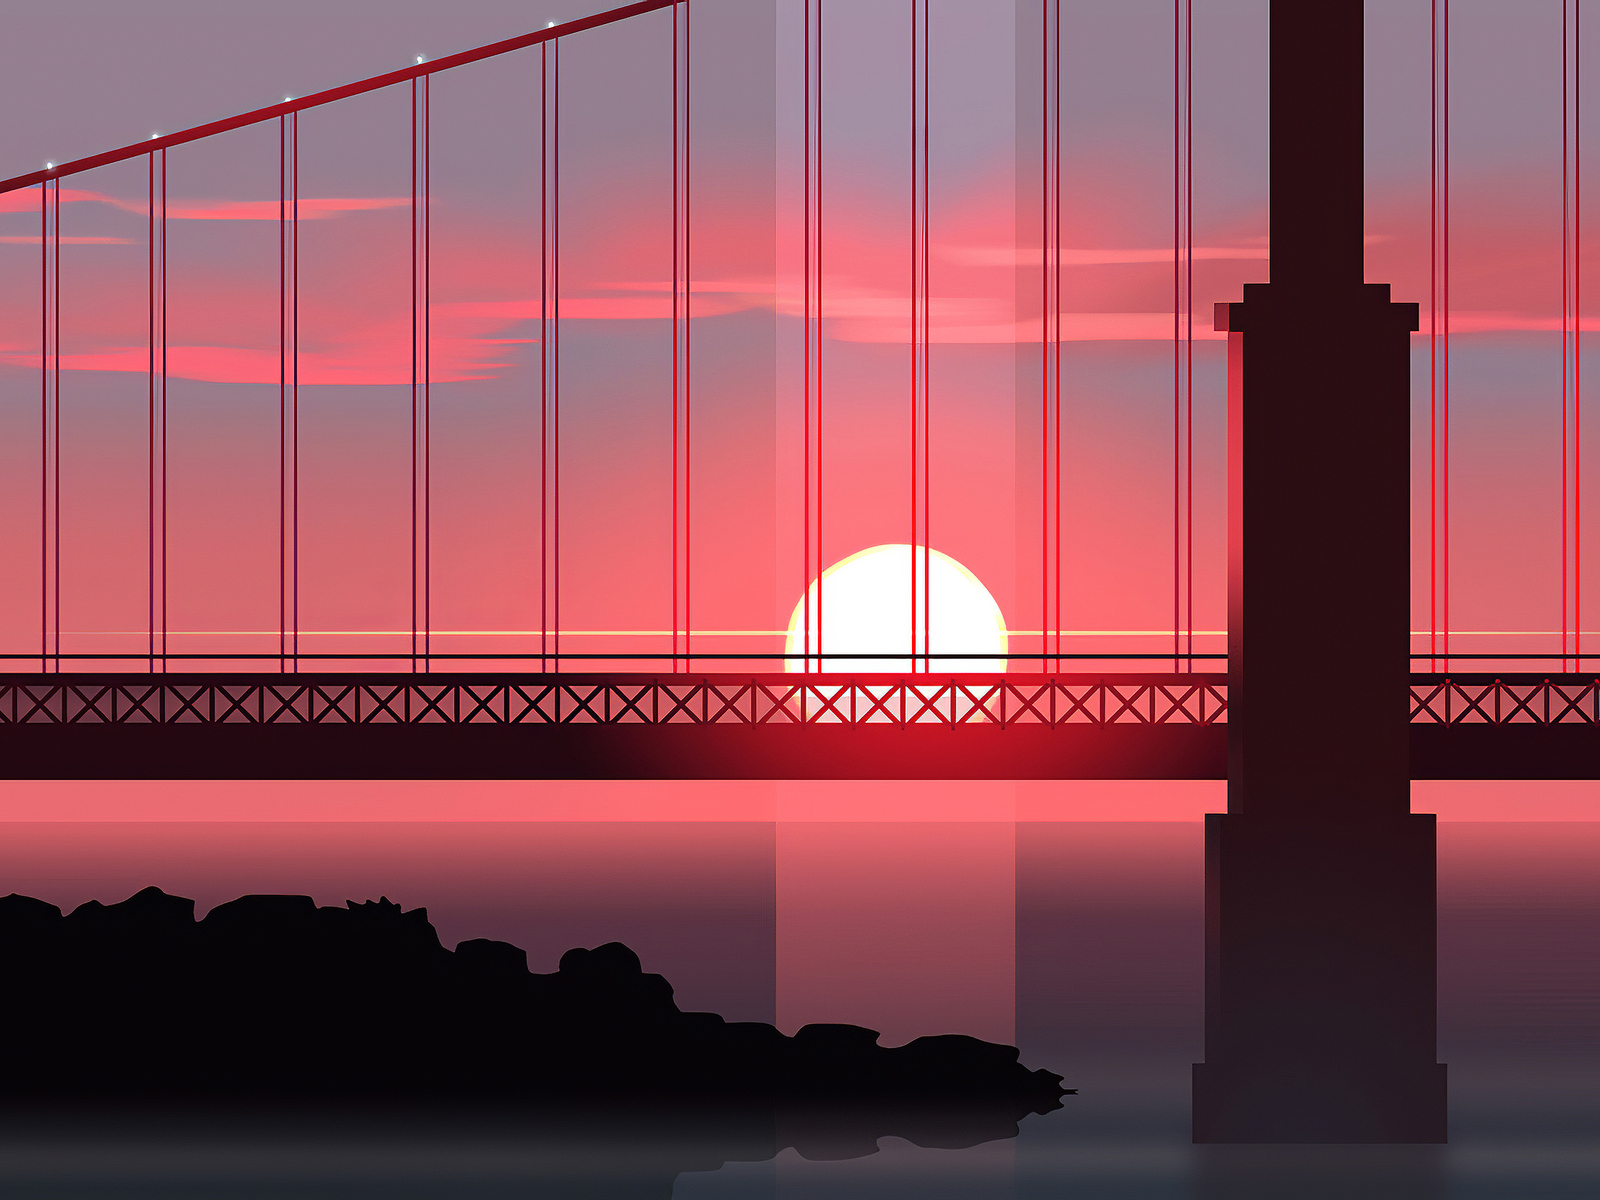 bridge-sunset-minimal-art-4k-l6.jpg